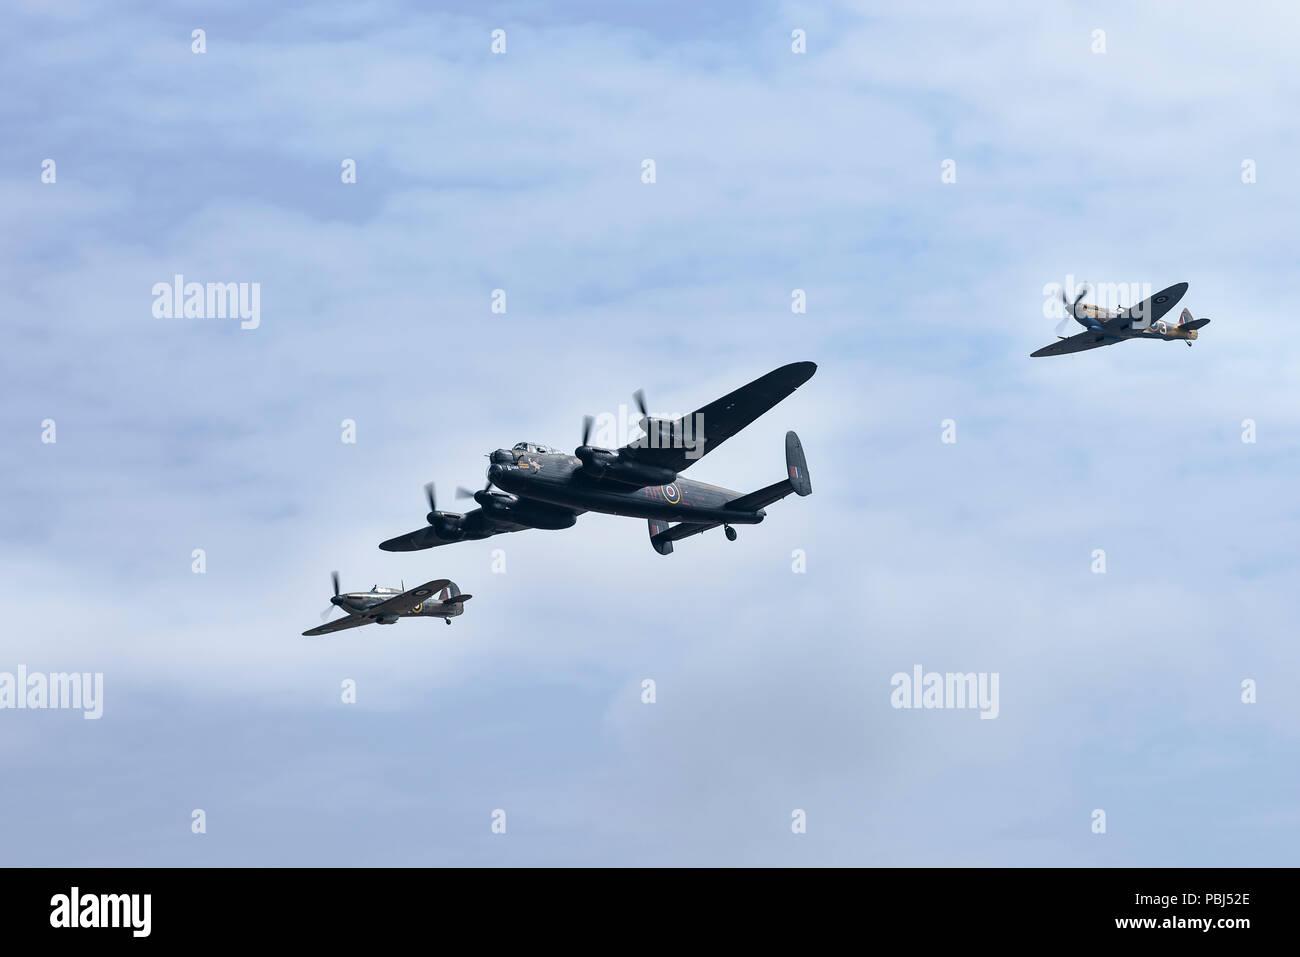 The Battle of Britain Memorial Flight, RAF Fairford, 2018 - Stock Image